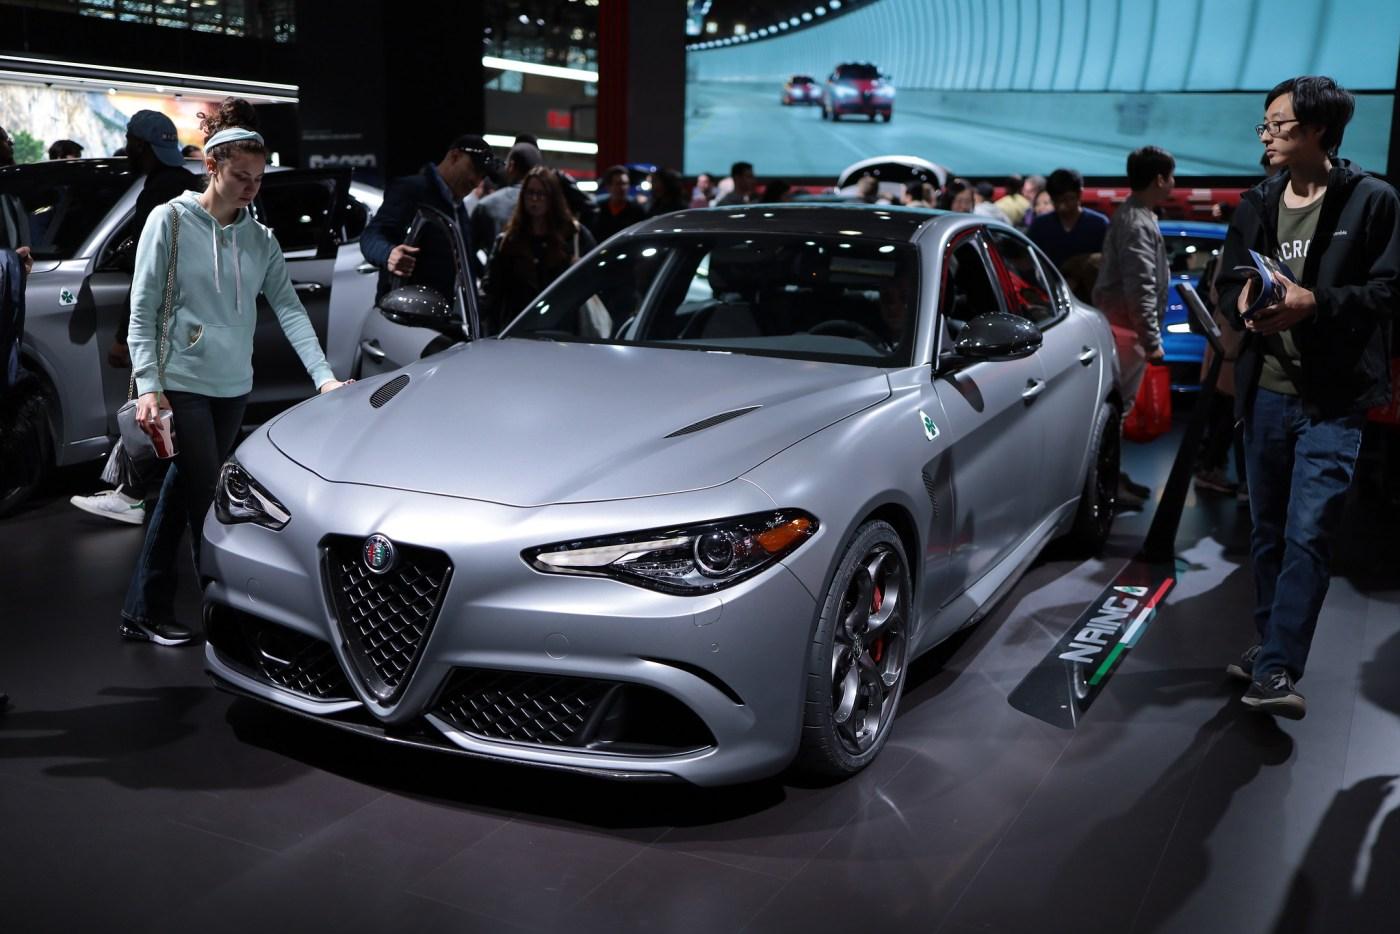 2019 Alfa Romeo Giulia with Quadrifoglio matte paint